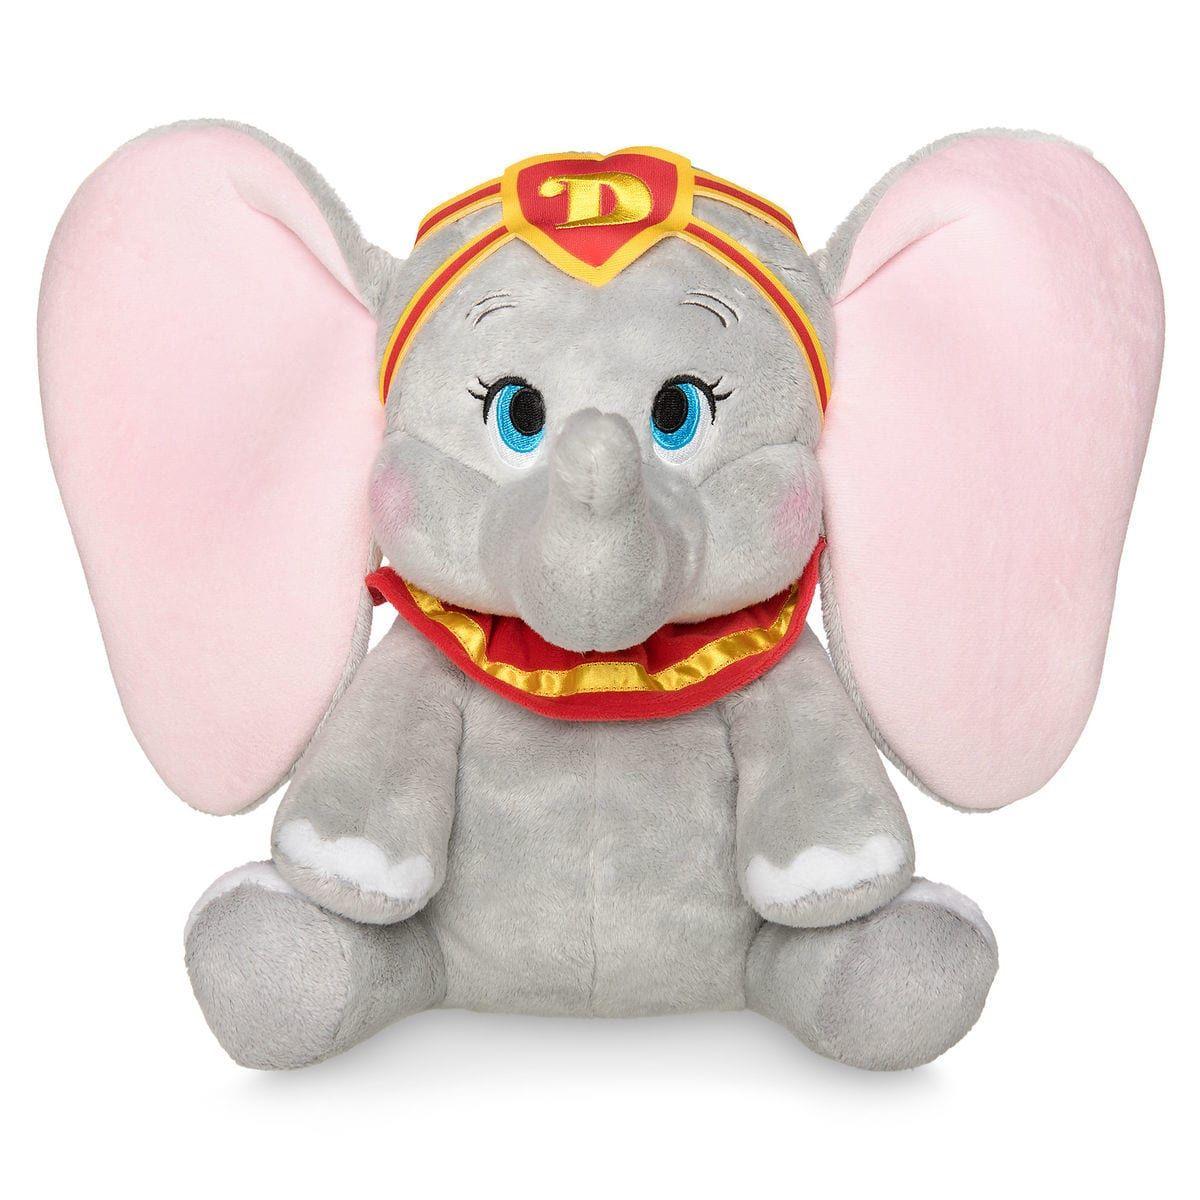 Authentic Disney Dumbo Plush Pillow 15/'/'  New W// Tag